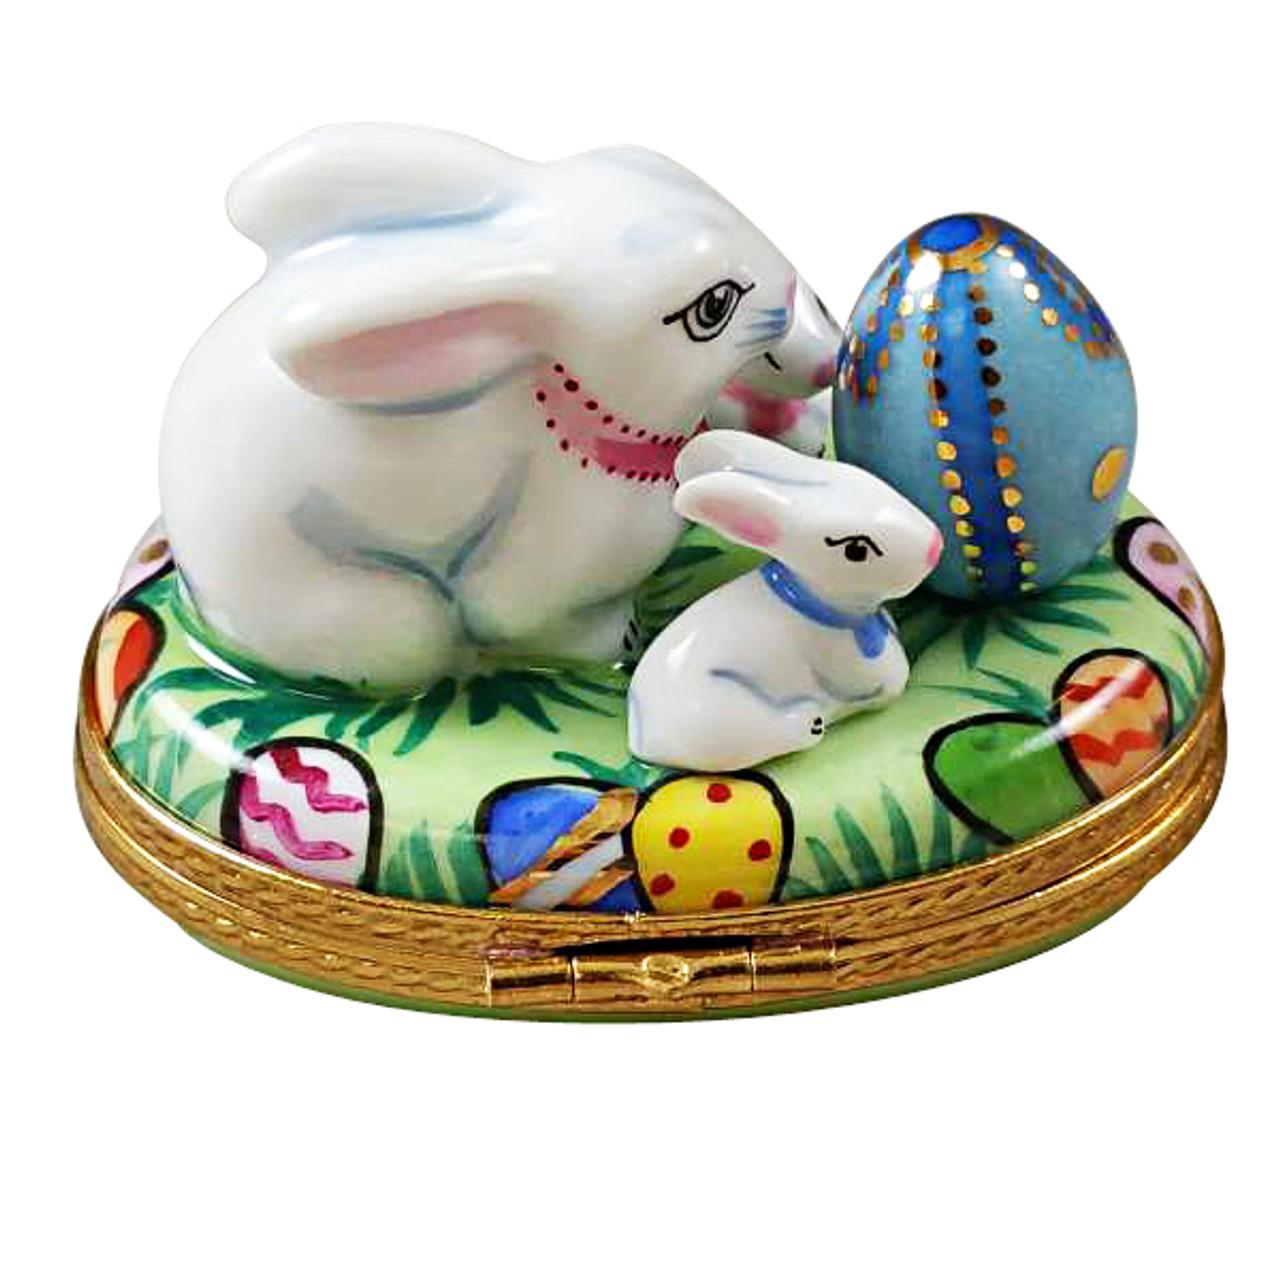 Bunny With Egg And Babies Rochard Limoges Box